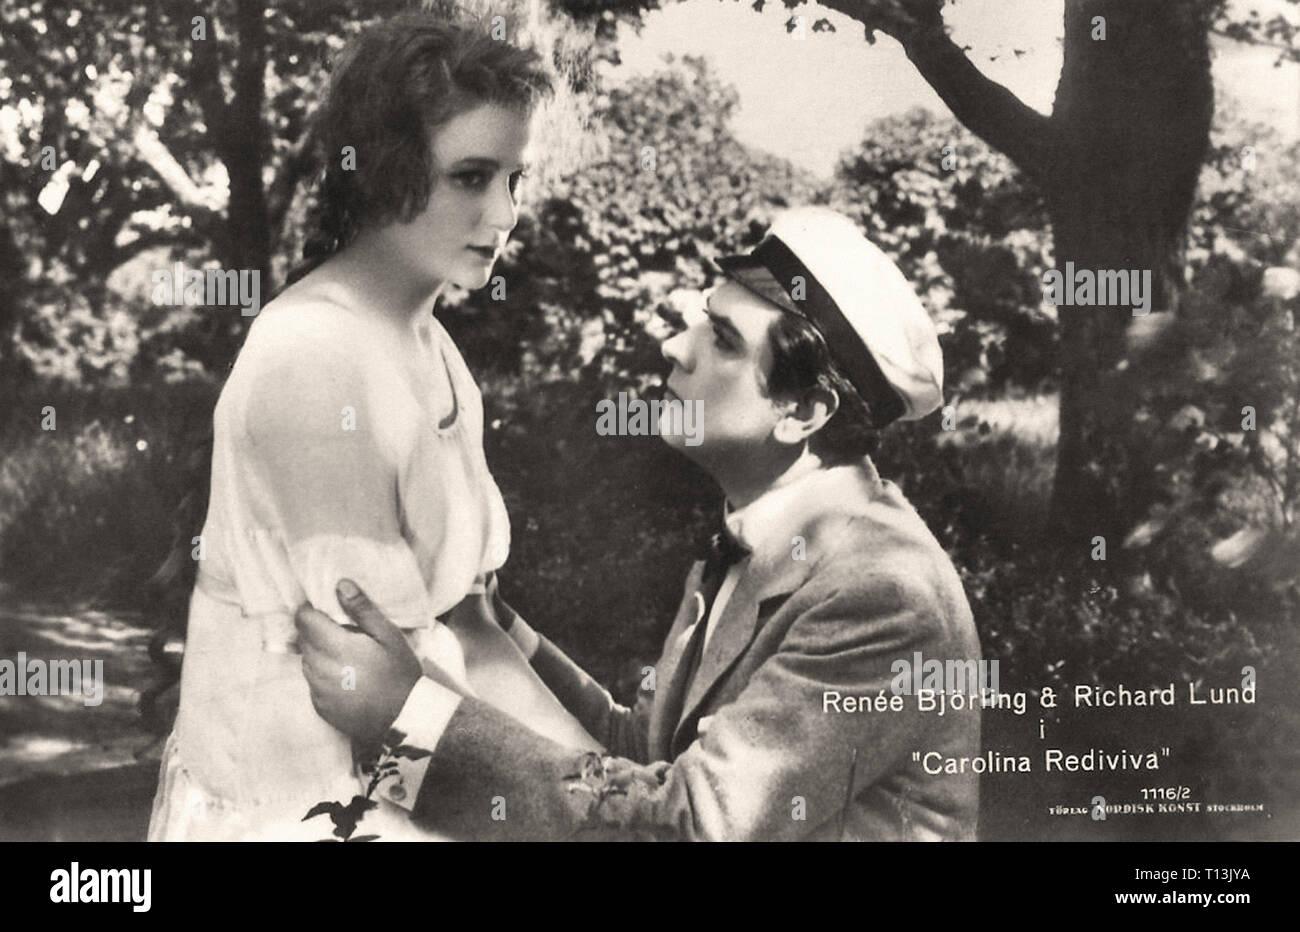 Promotional photography of Renée Björling and Richard Lund in Carolina Rediviva (1920) - Silent movie era Stock Photo